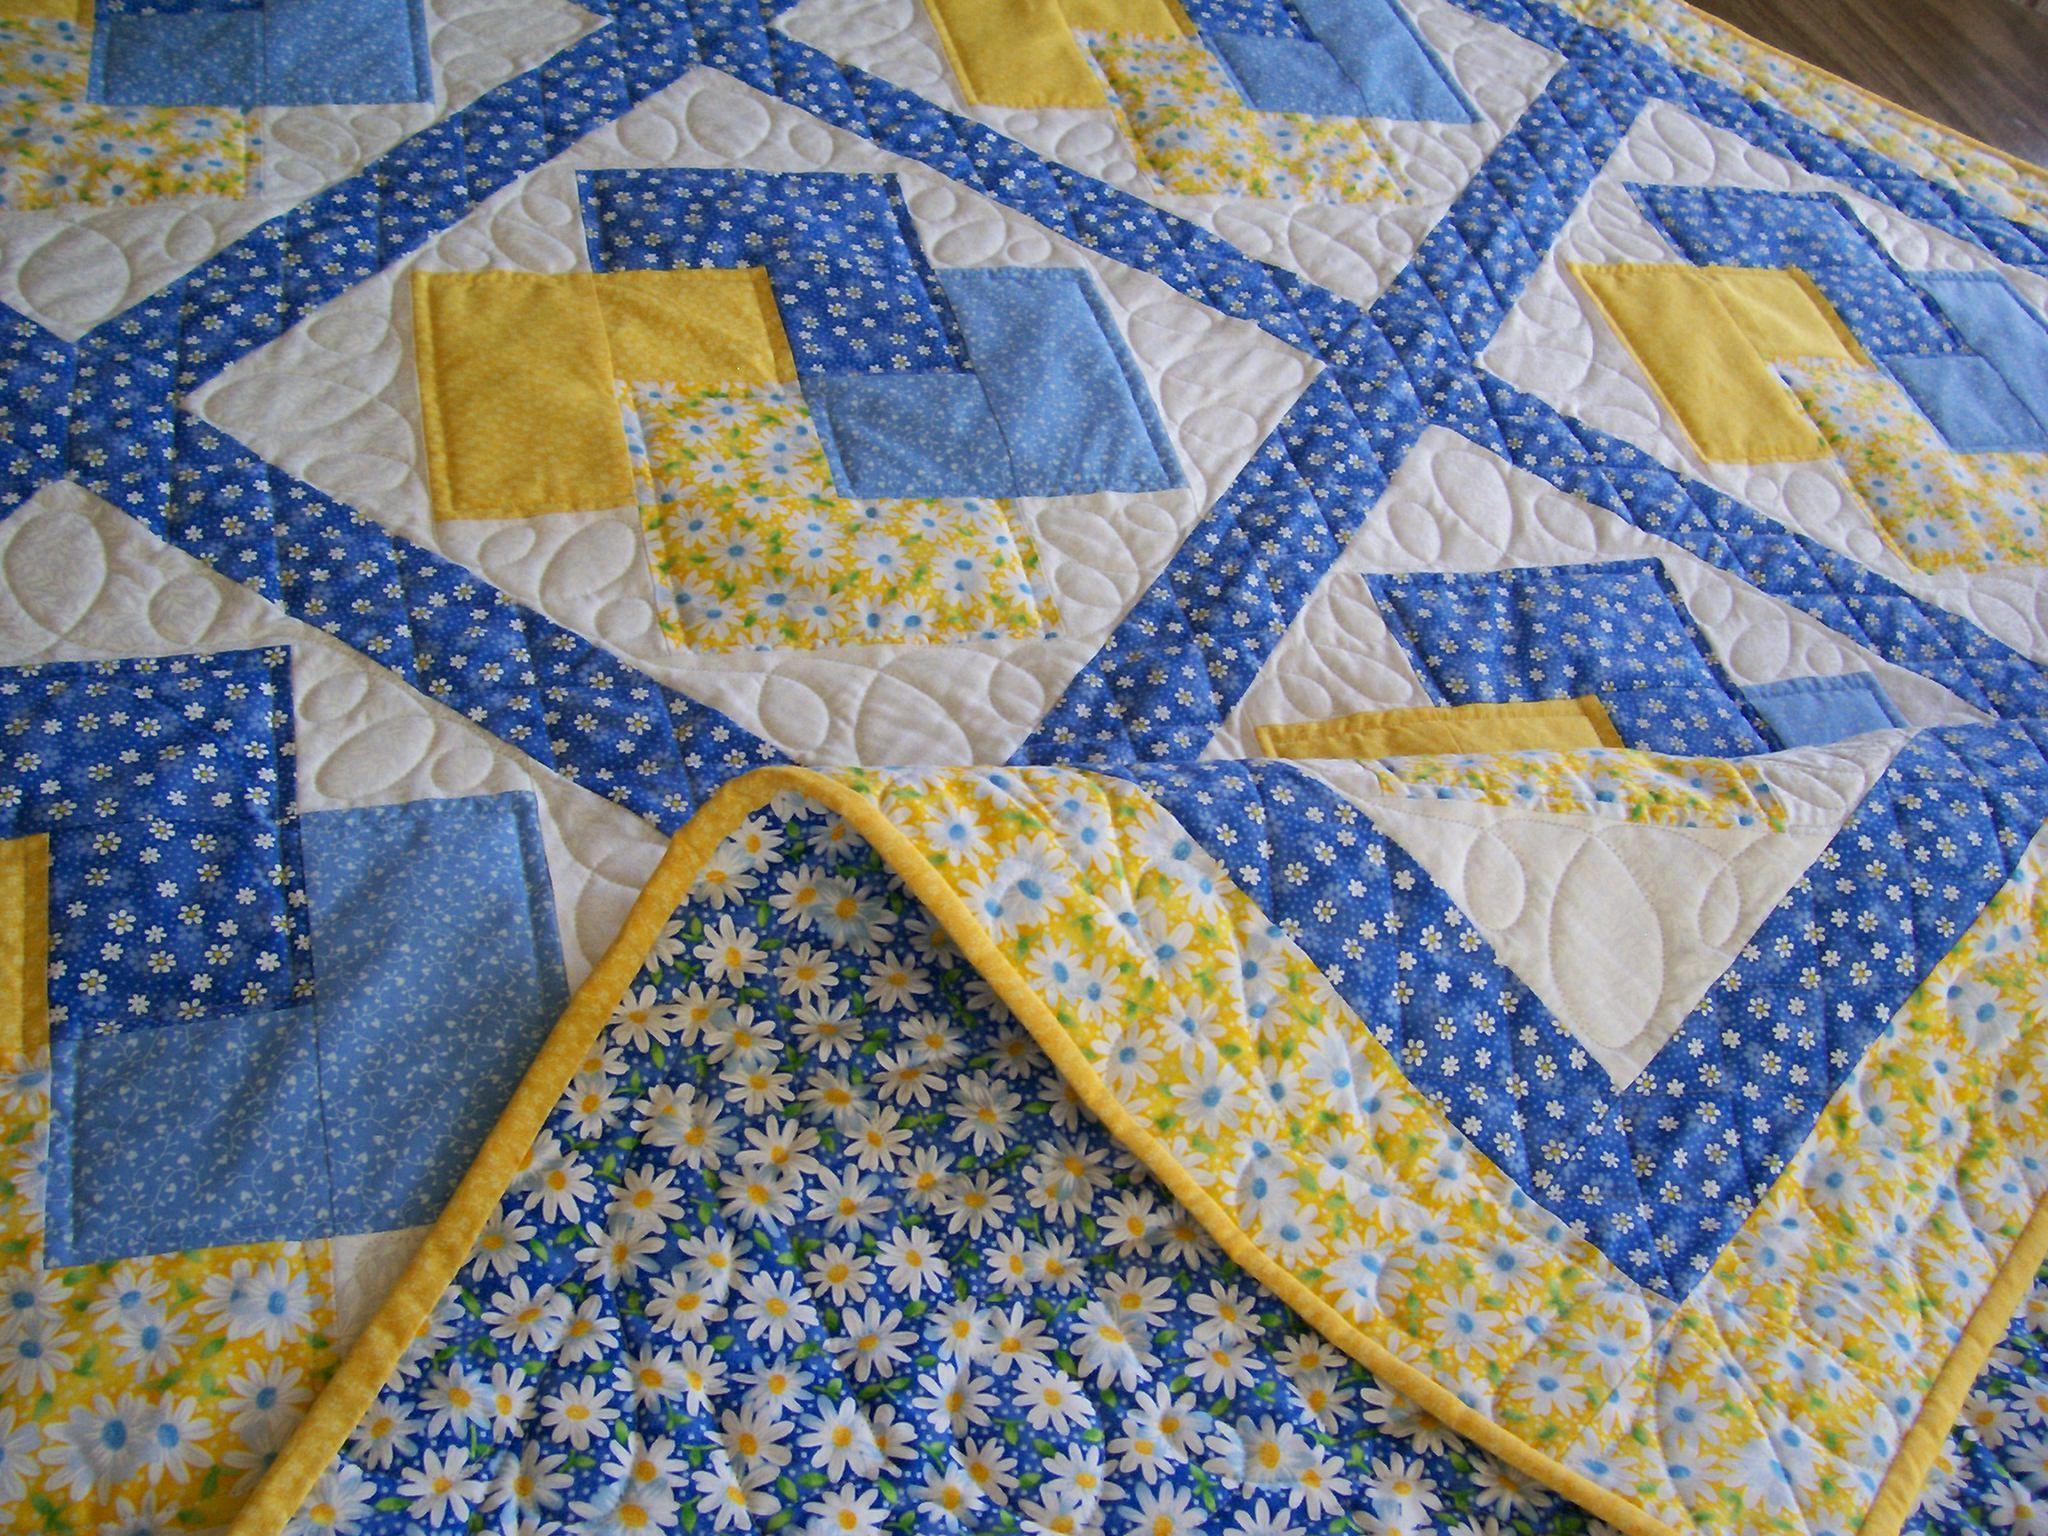 winning hand quilt pattern | here is my winning hand quilt still ...